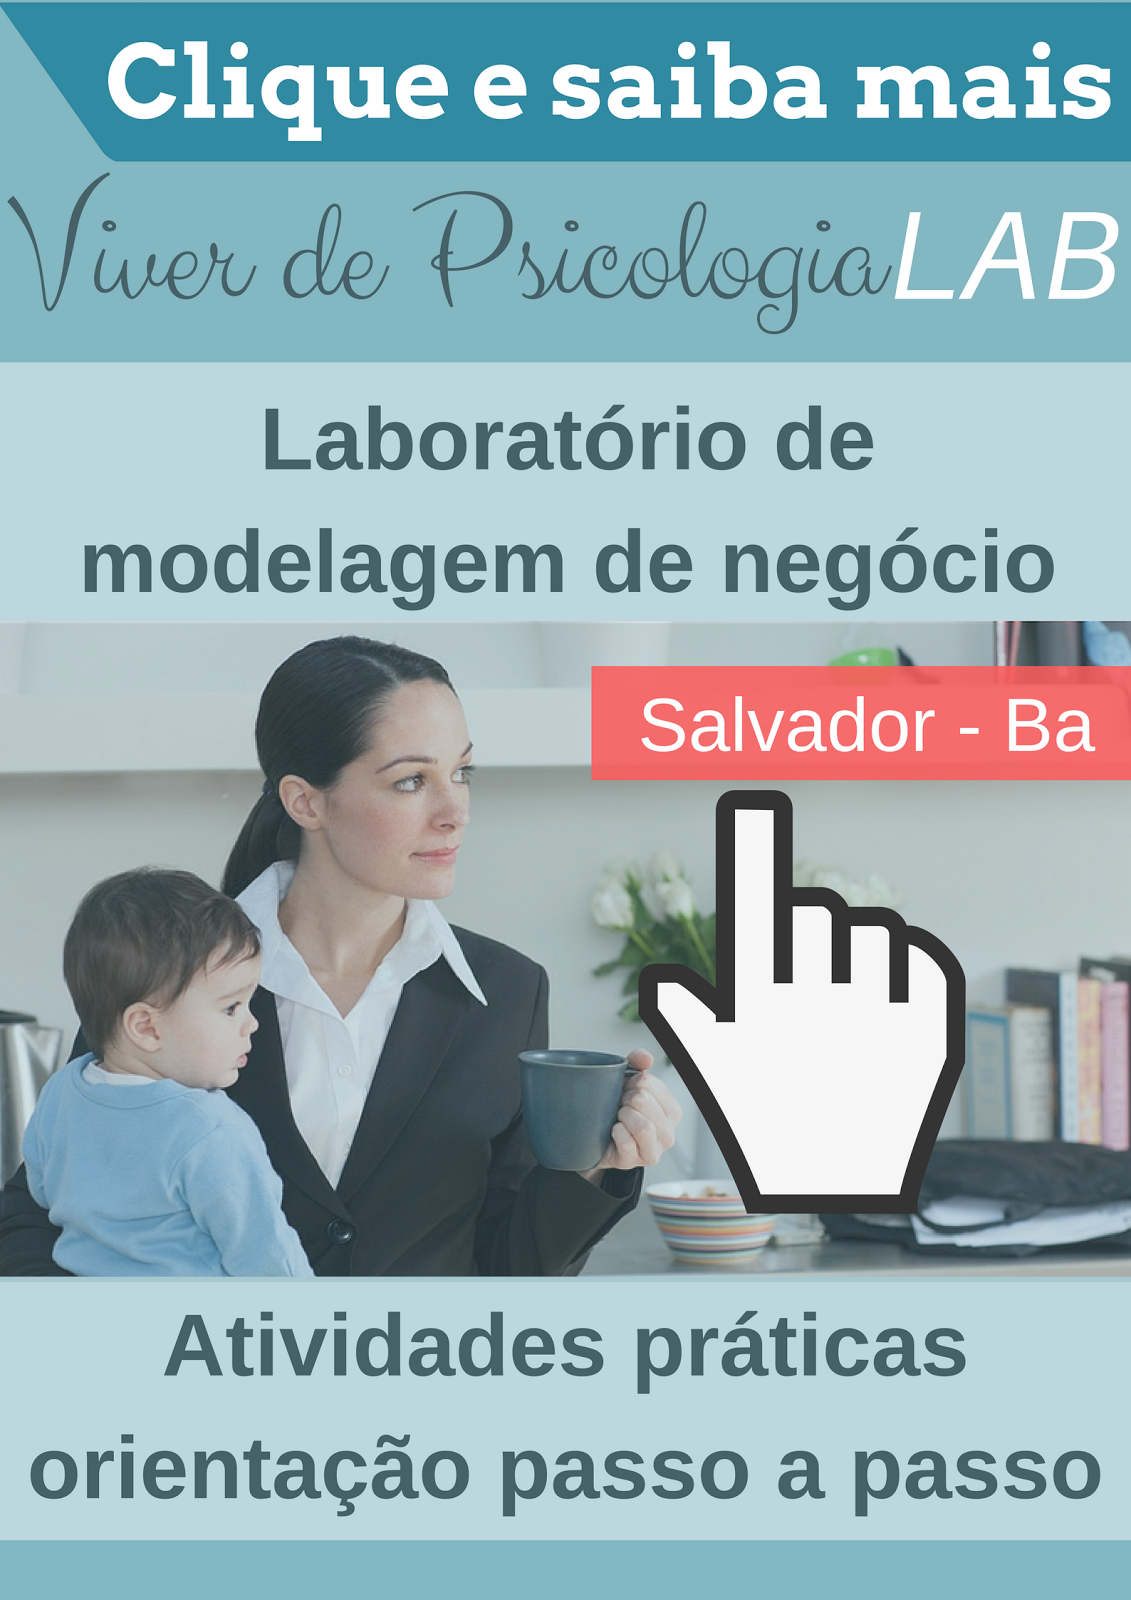 Viver de Psicologia Lab